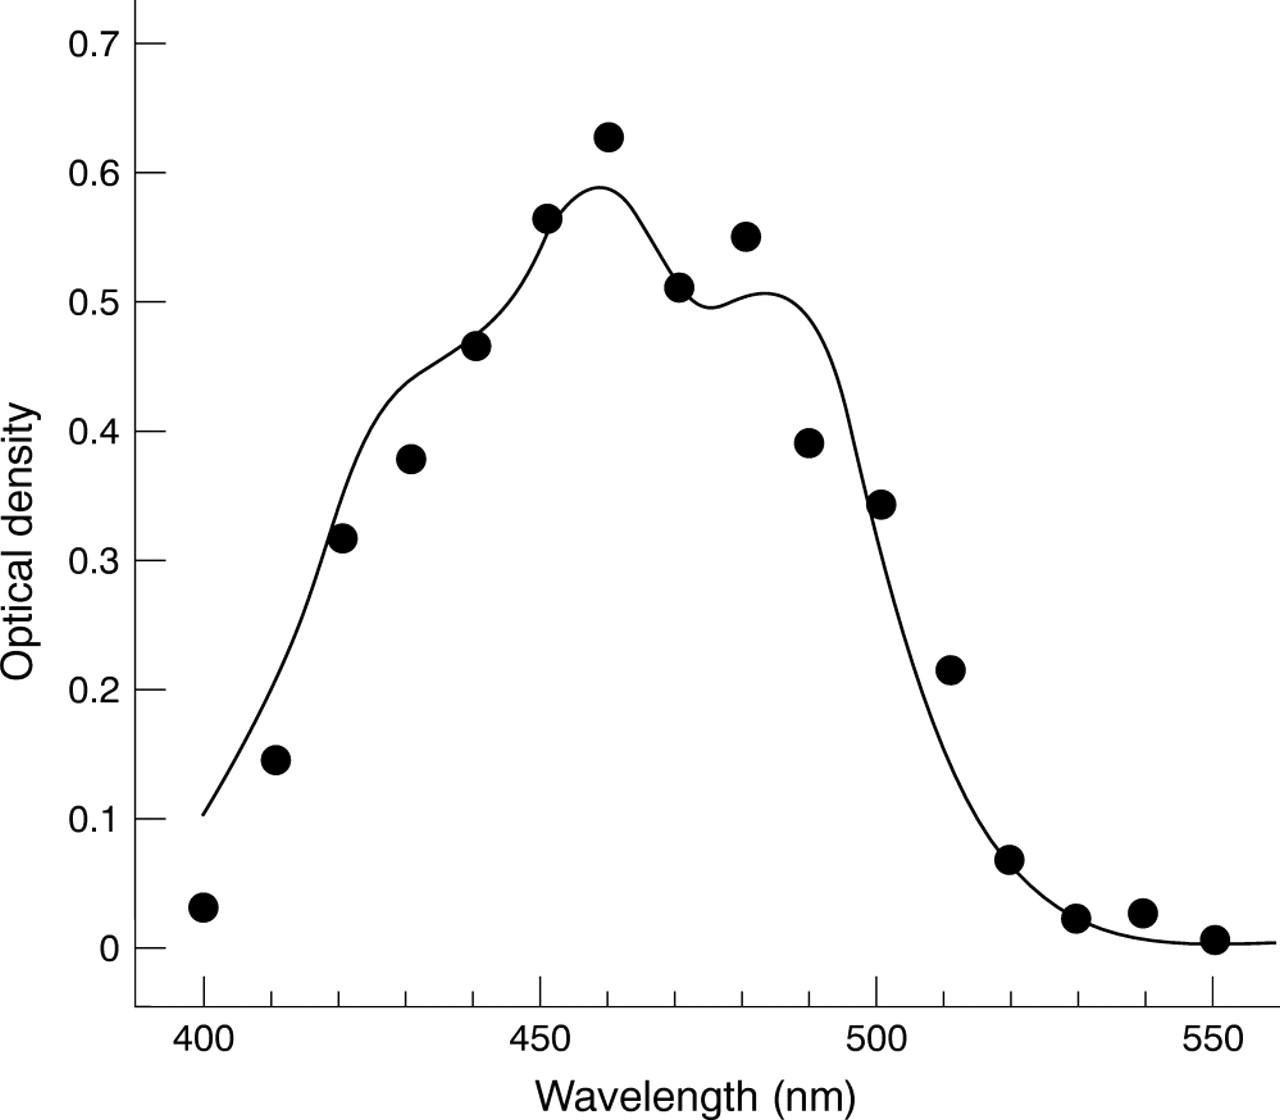 Macular Pigment Optical Density